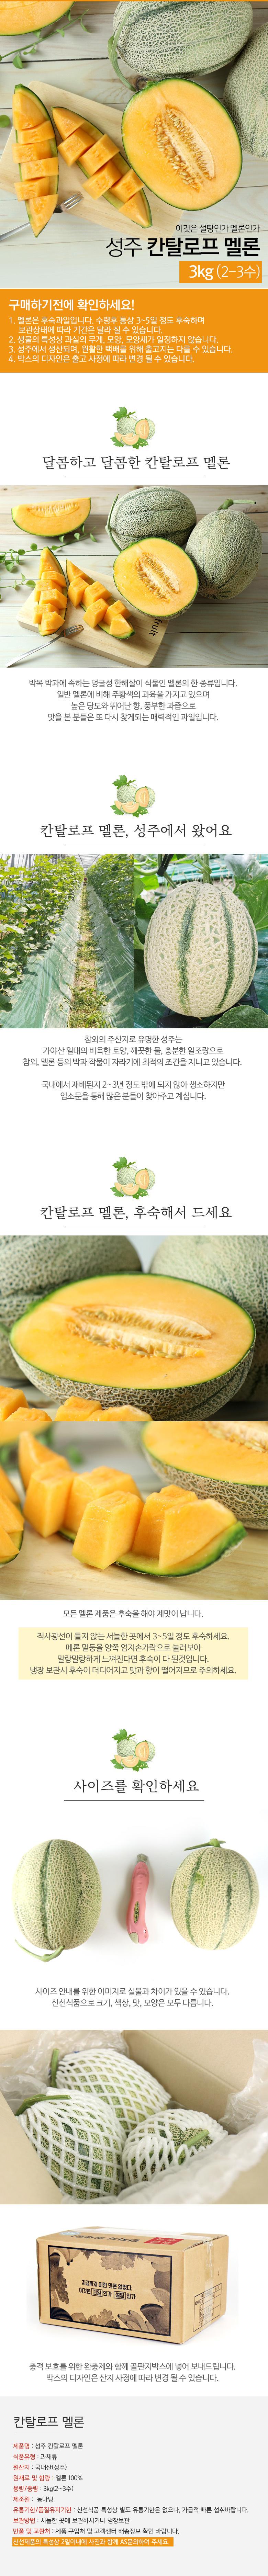 HN_CTmelon_3kg.jpg